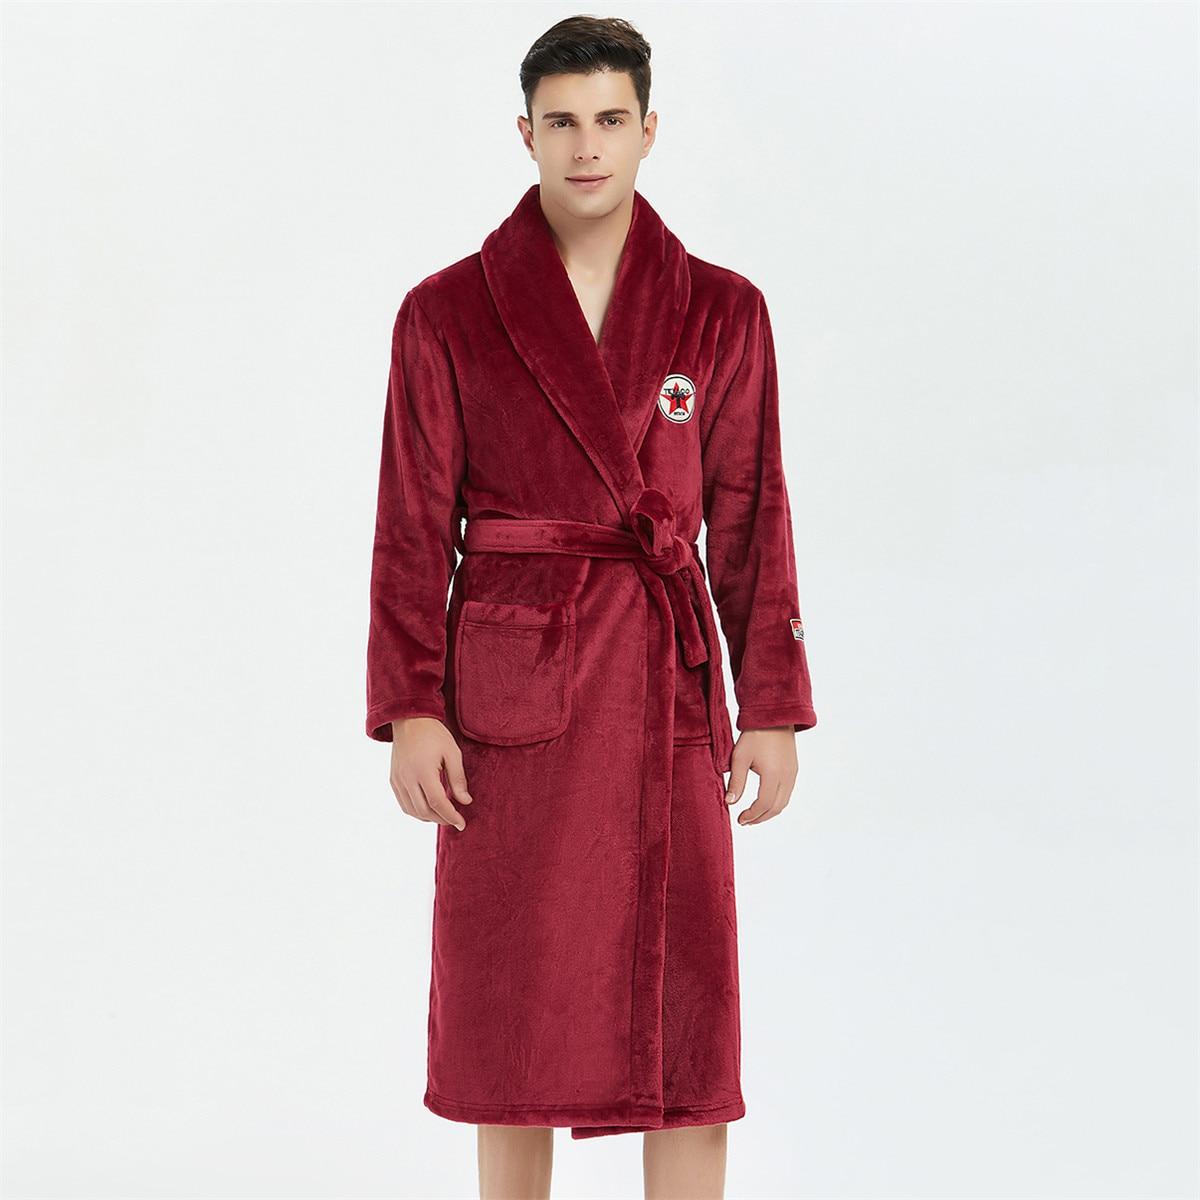 Coral Fleece Men Kimono Robe Flannel Sleepwear Nightgown Short Home Clothing Burgundy Nightwear Home Wear Winter Warm Bathrobe